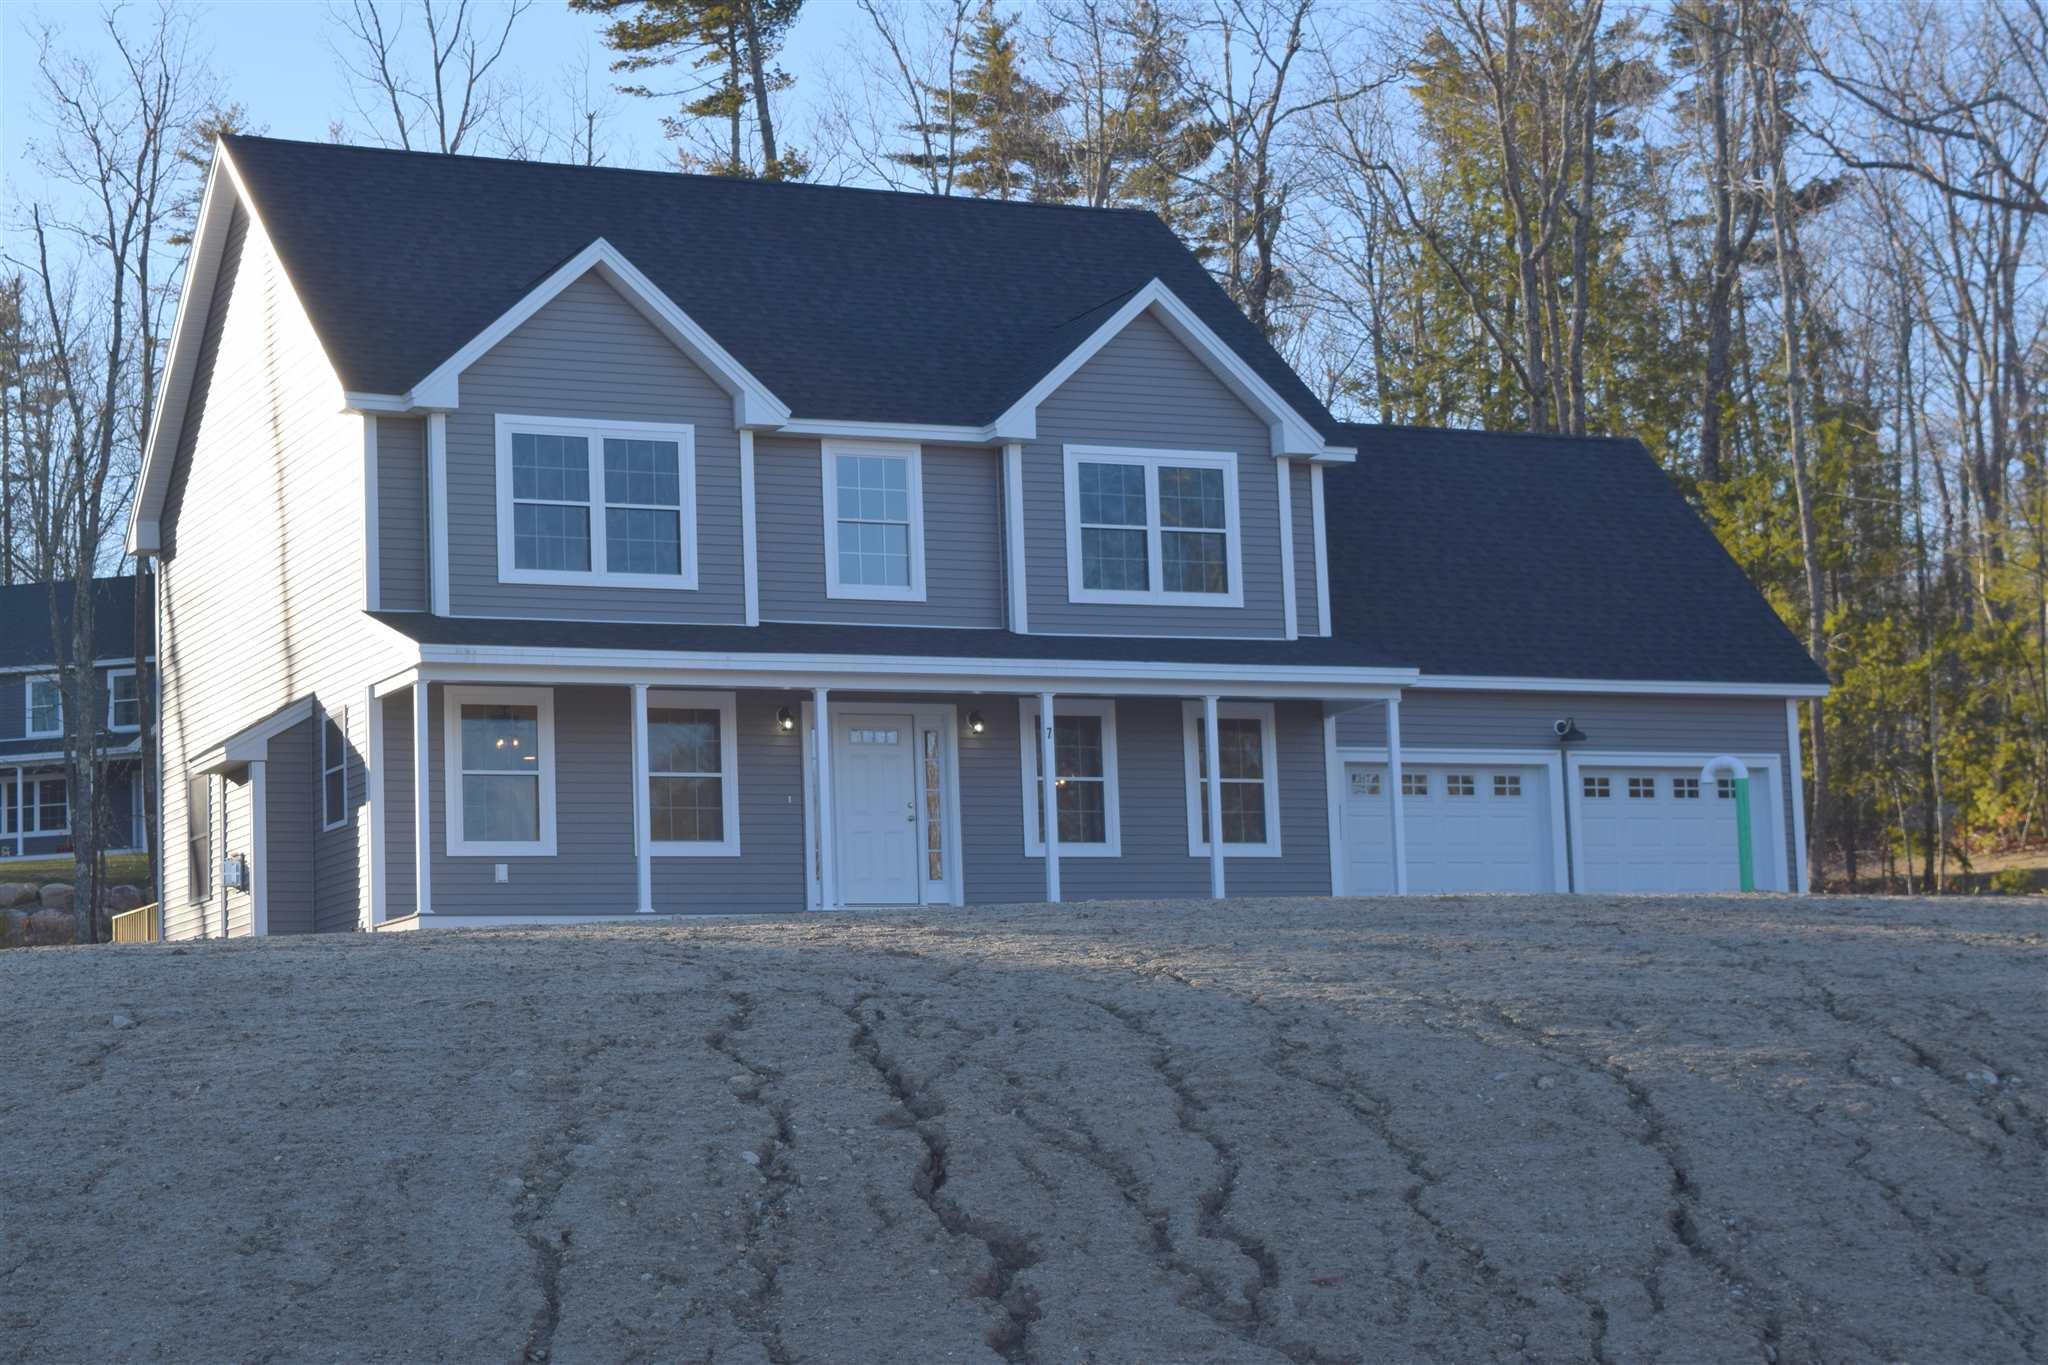 Lot 15 Lakeside Estates (7 Overlook Dr)